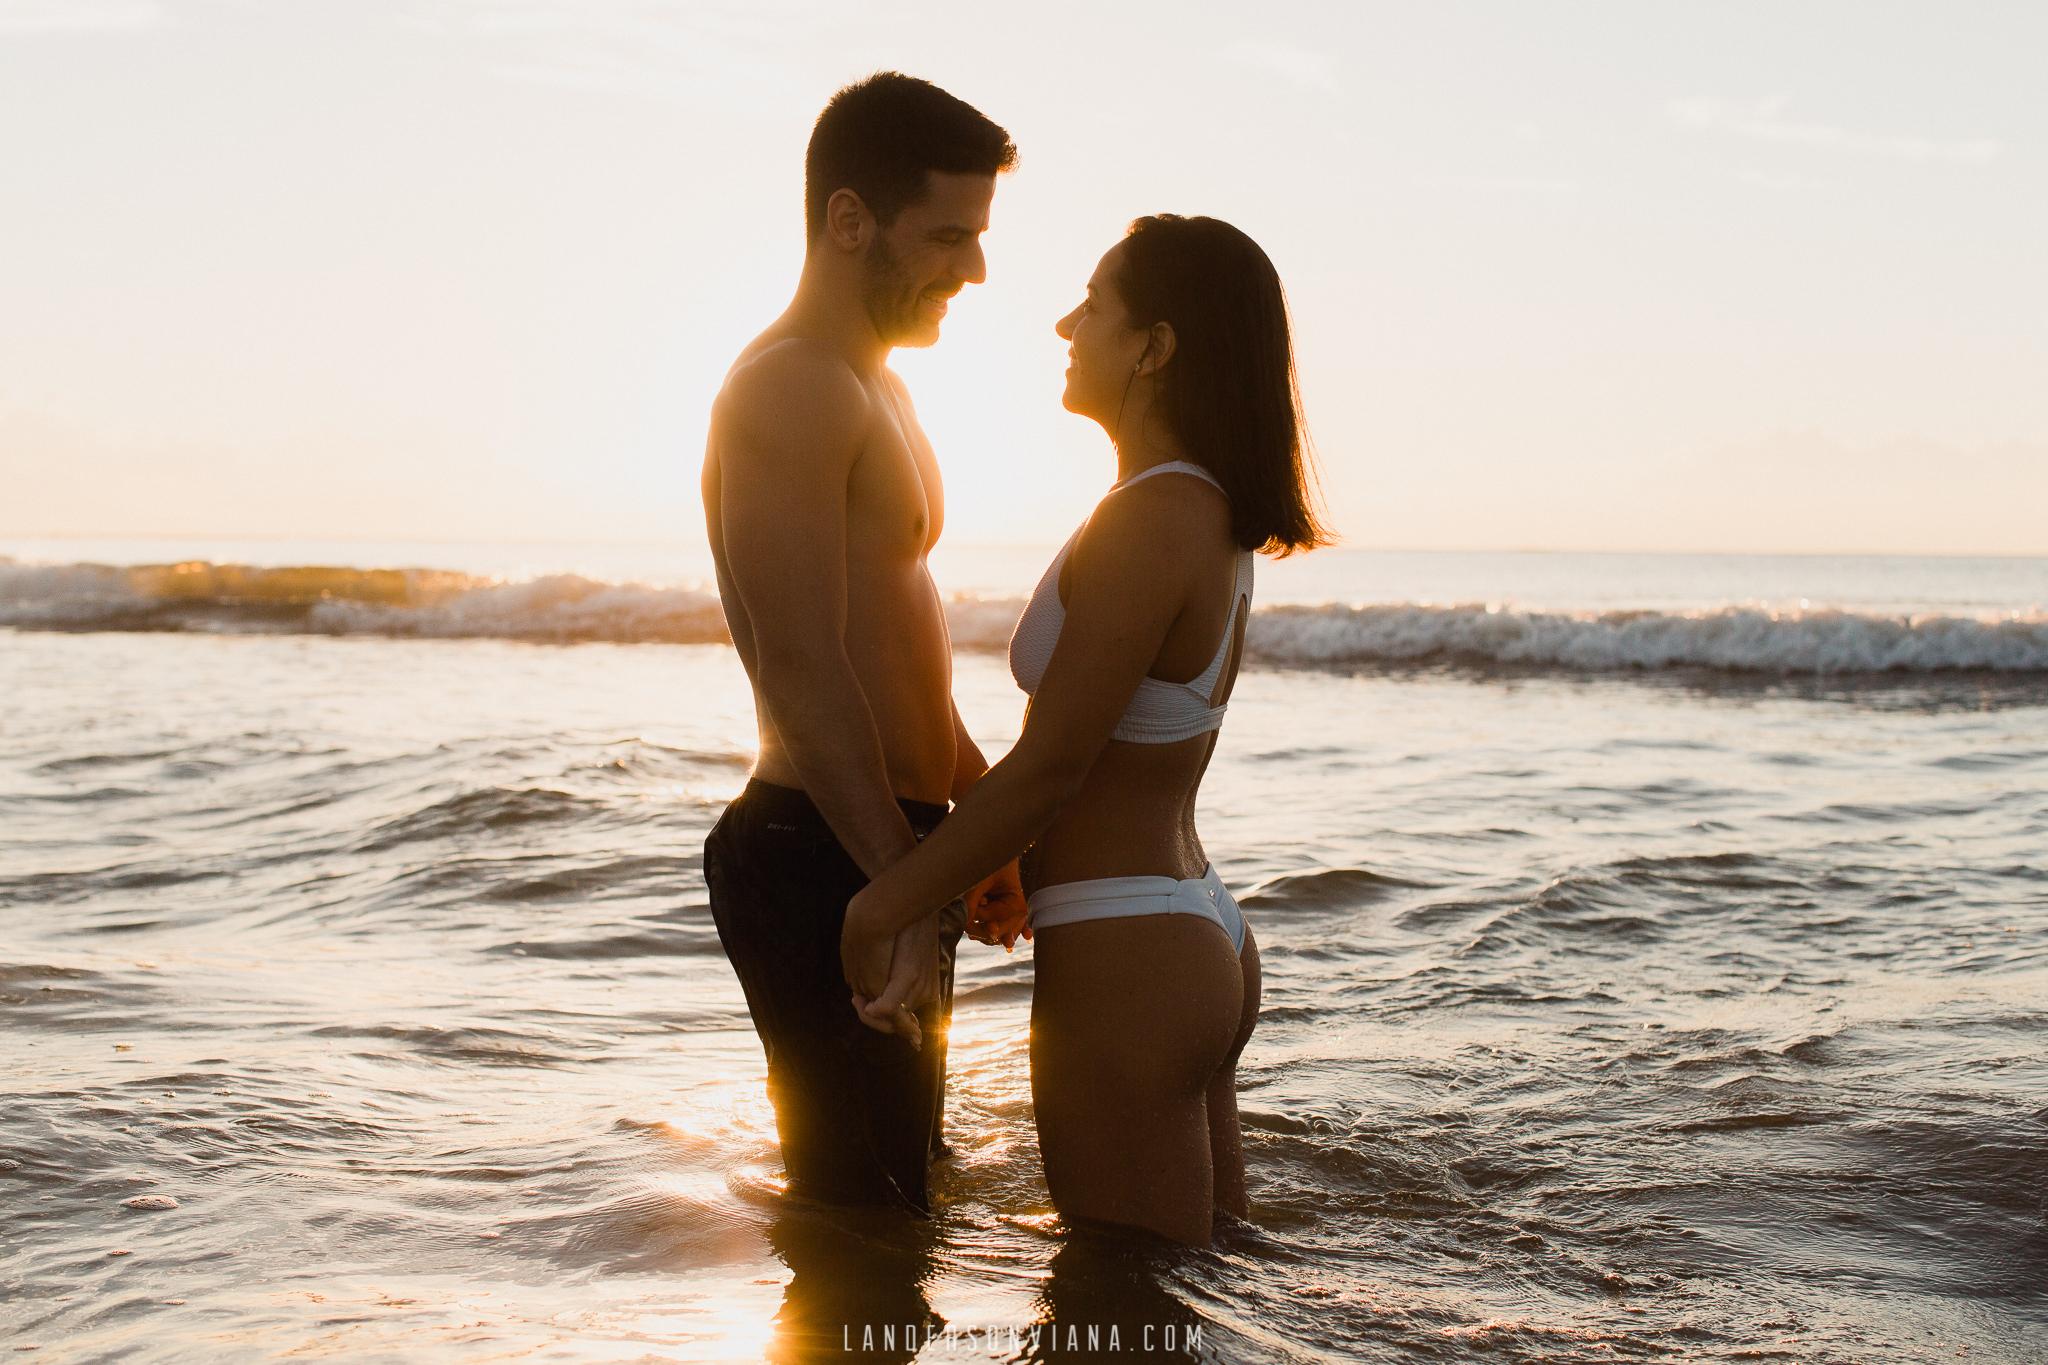 ensaio-pre-wedding-praia-landerson-viana-fotografia-casamento-pegueiobouquet-69.jpg